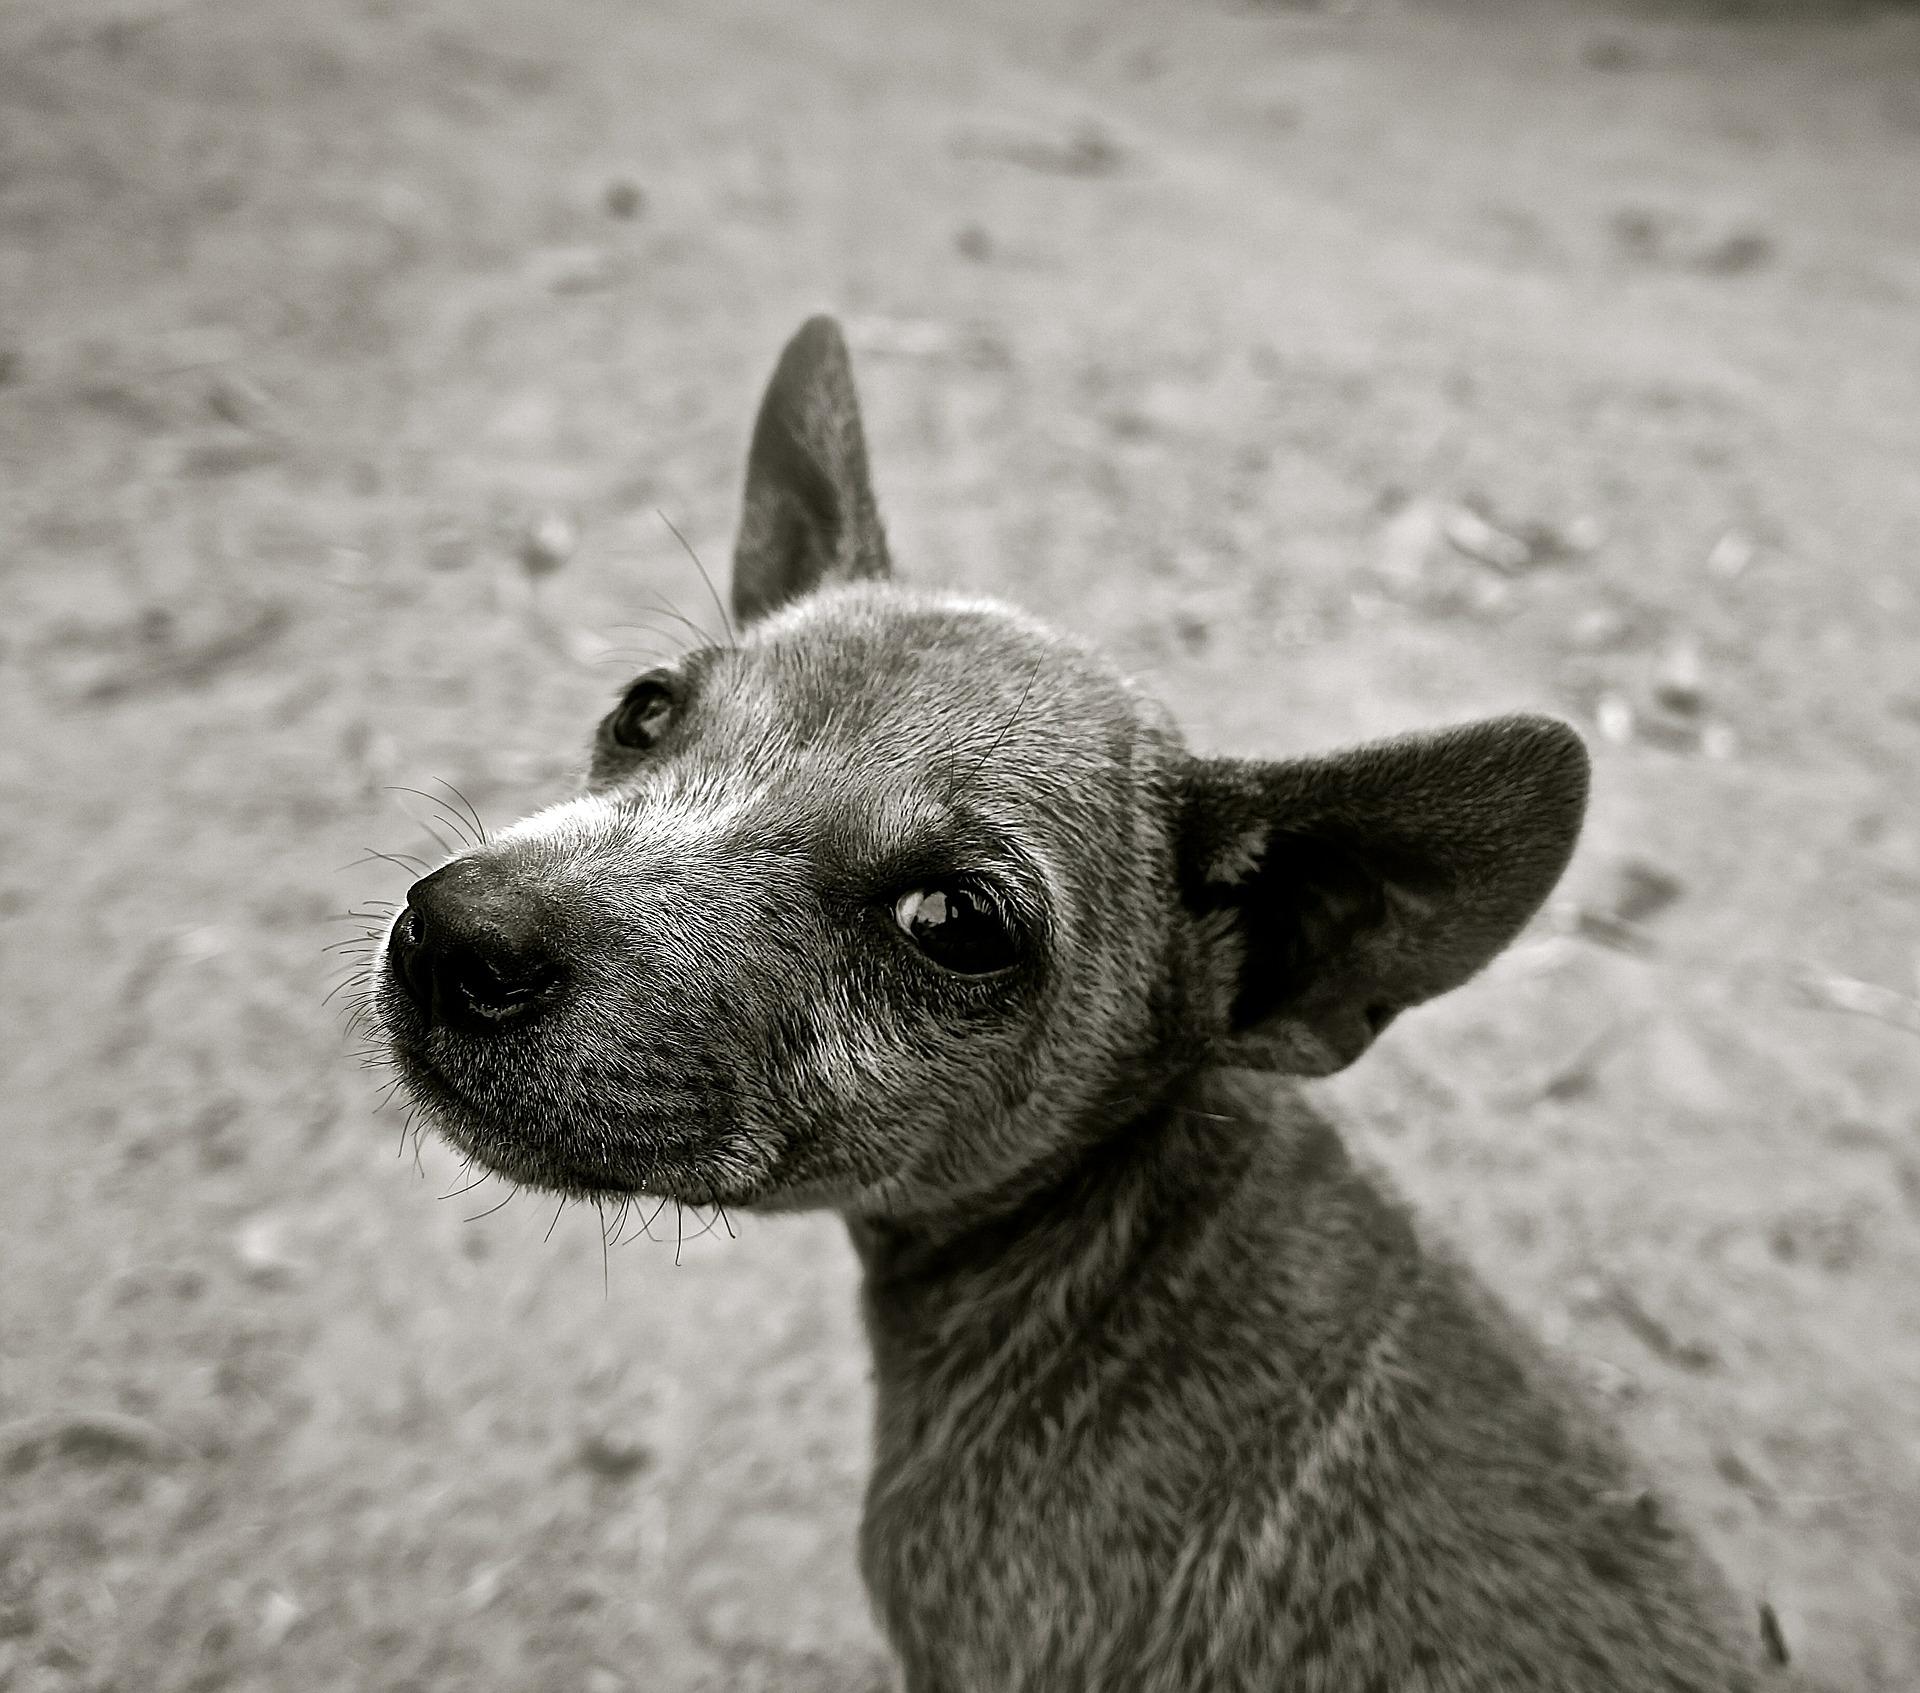 dog-589002_1920.jpg